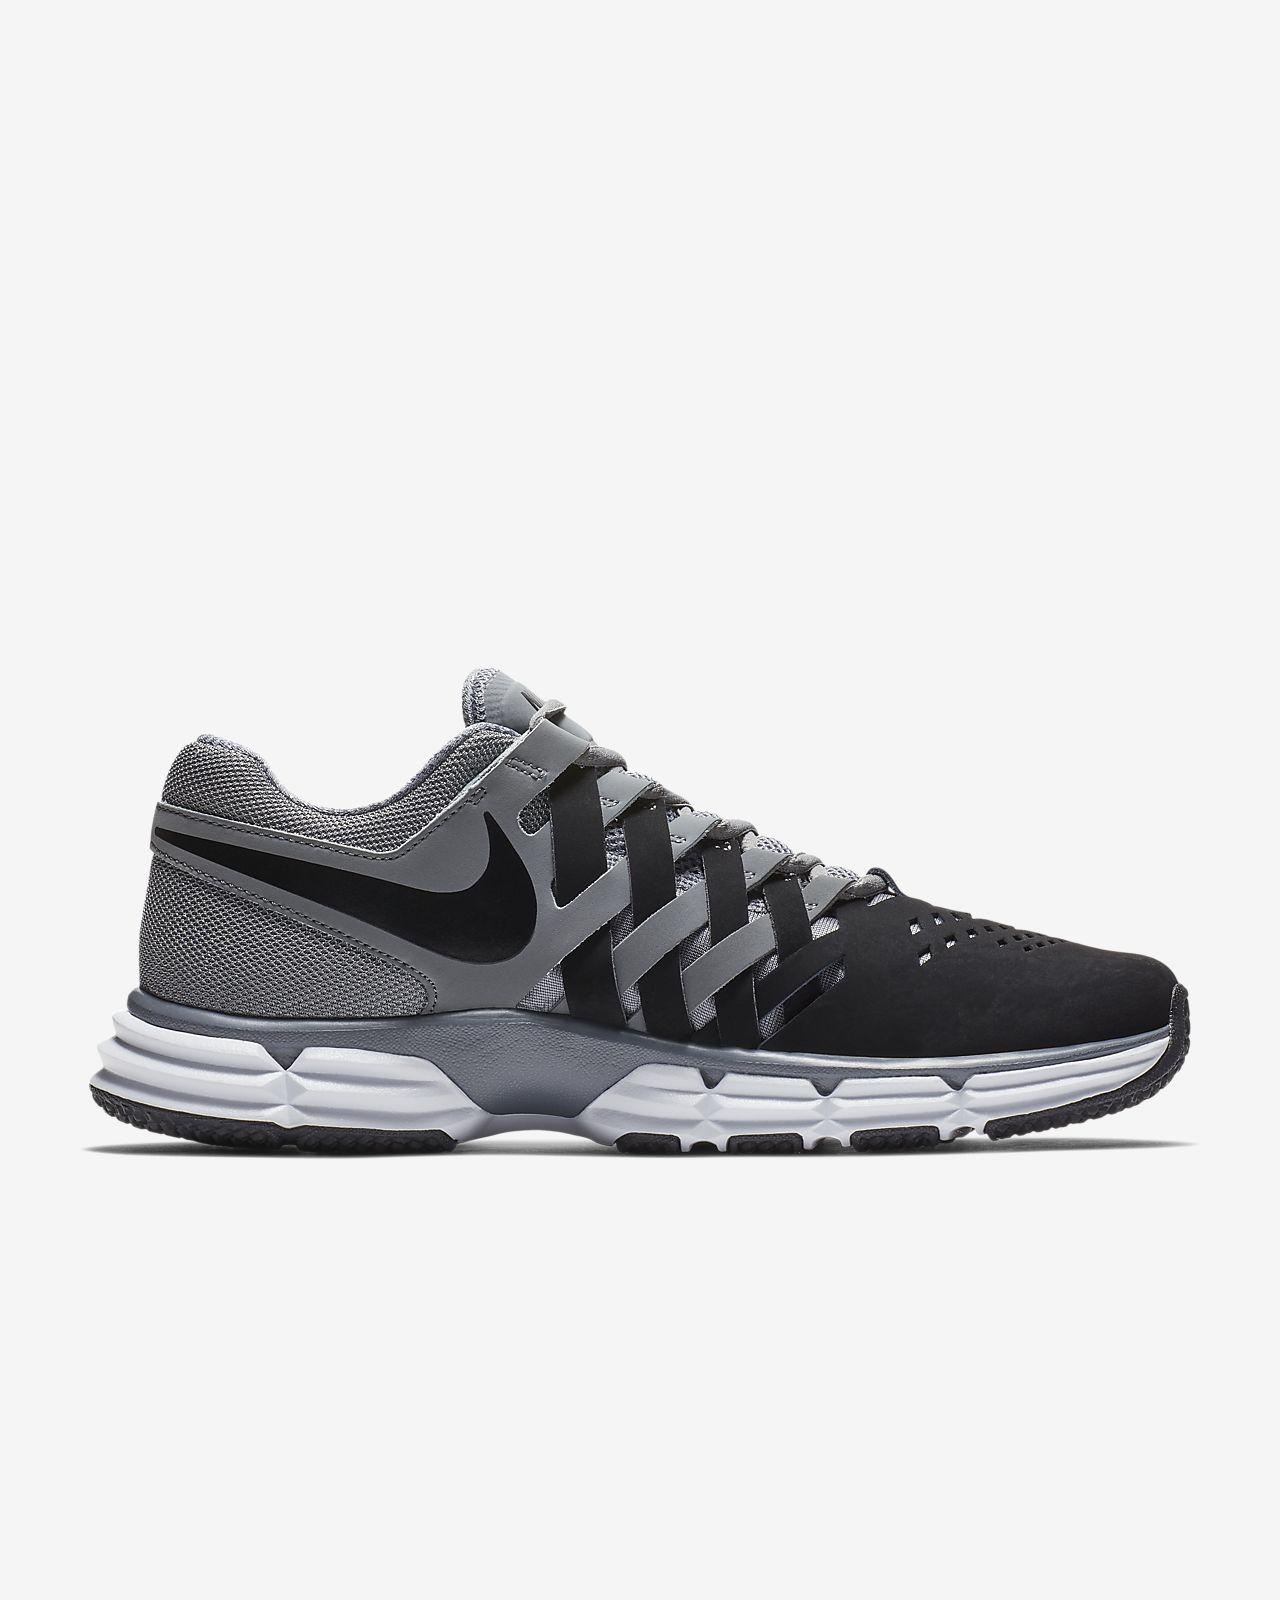 the latest 0ff48 18e0d ... Nike Lunar Fingertrap TR Men s Gym Gameday Shoe